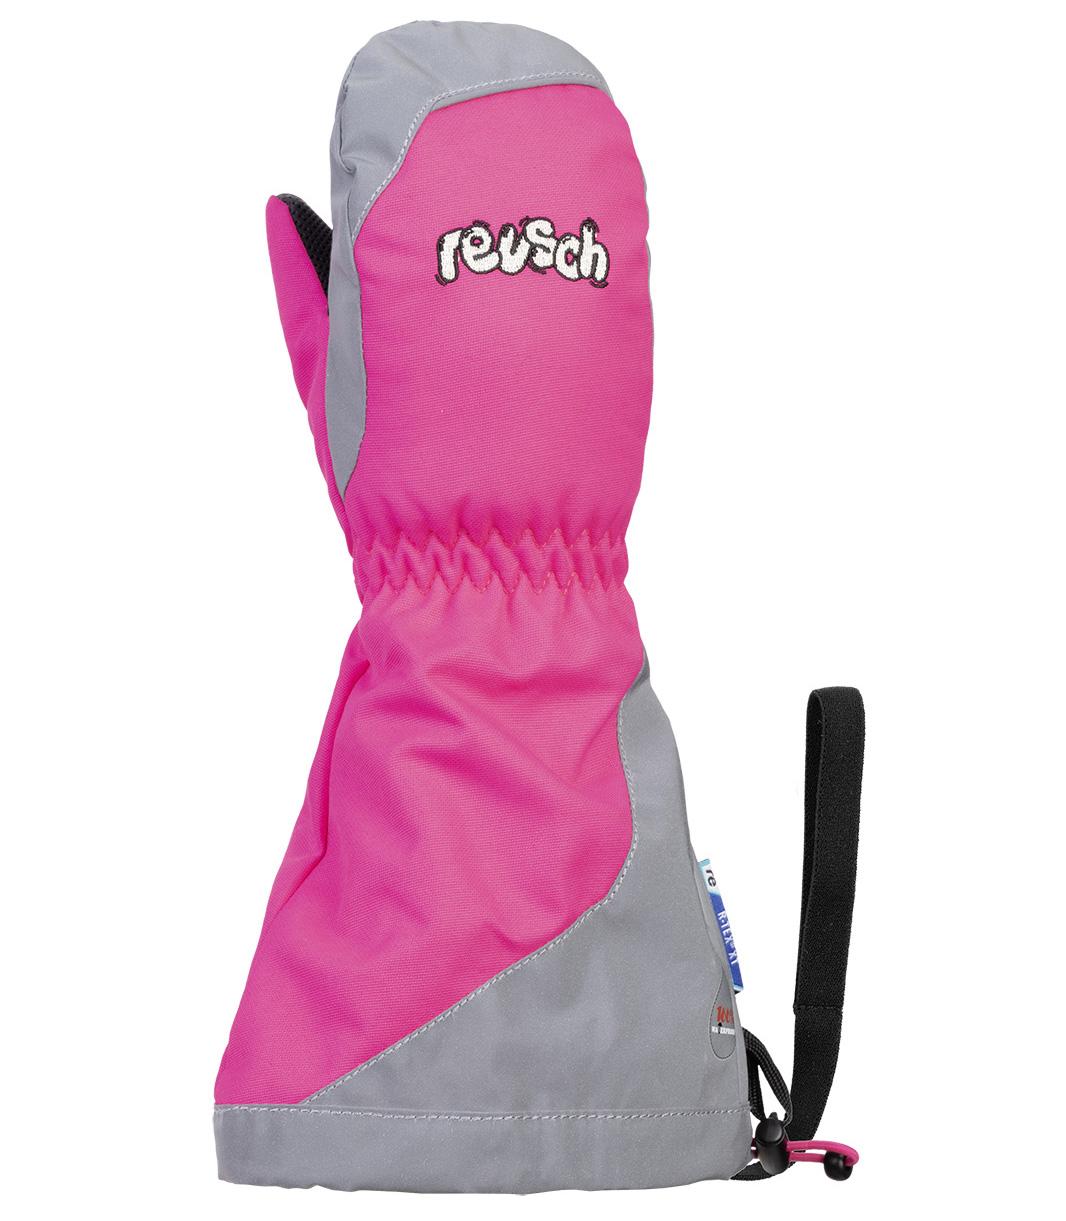 Варежки Reusch 2020-21 Walter R-Tex® Xt Mitten Pink Glo/Reflective (Inch (Дюйм):Iv)